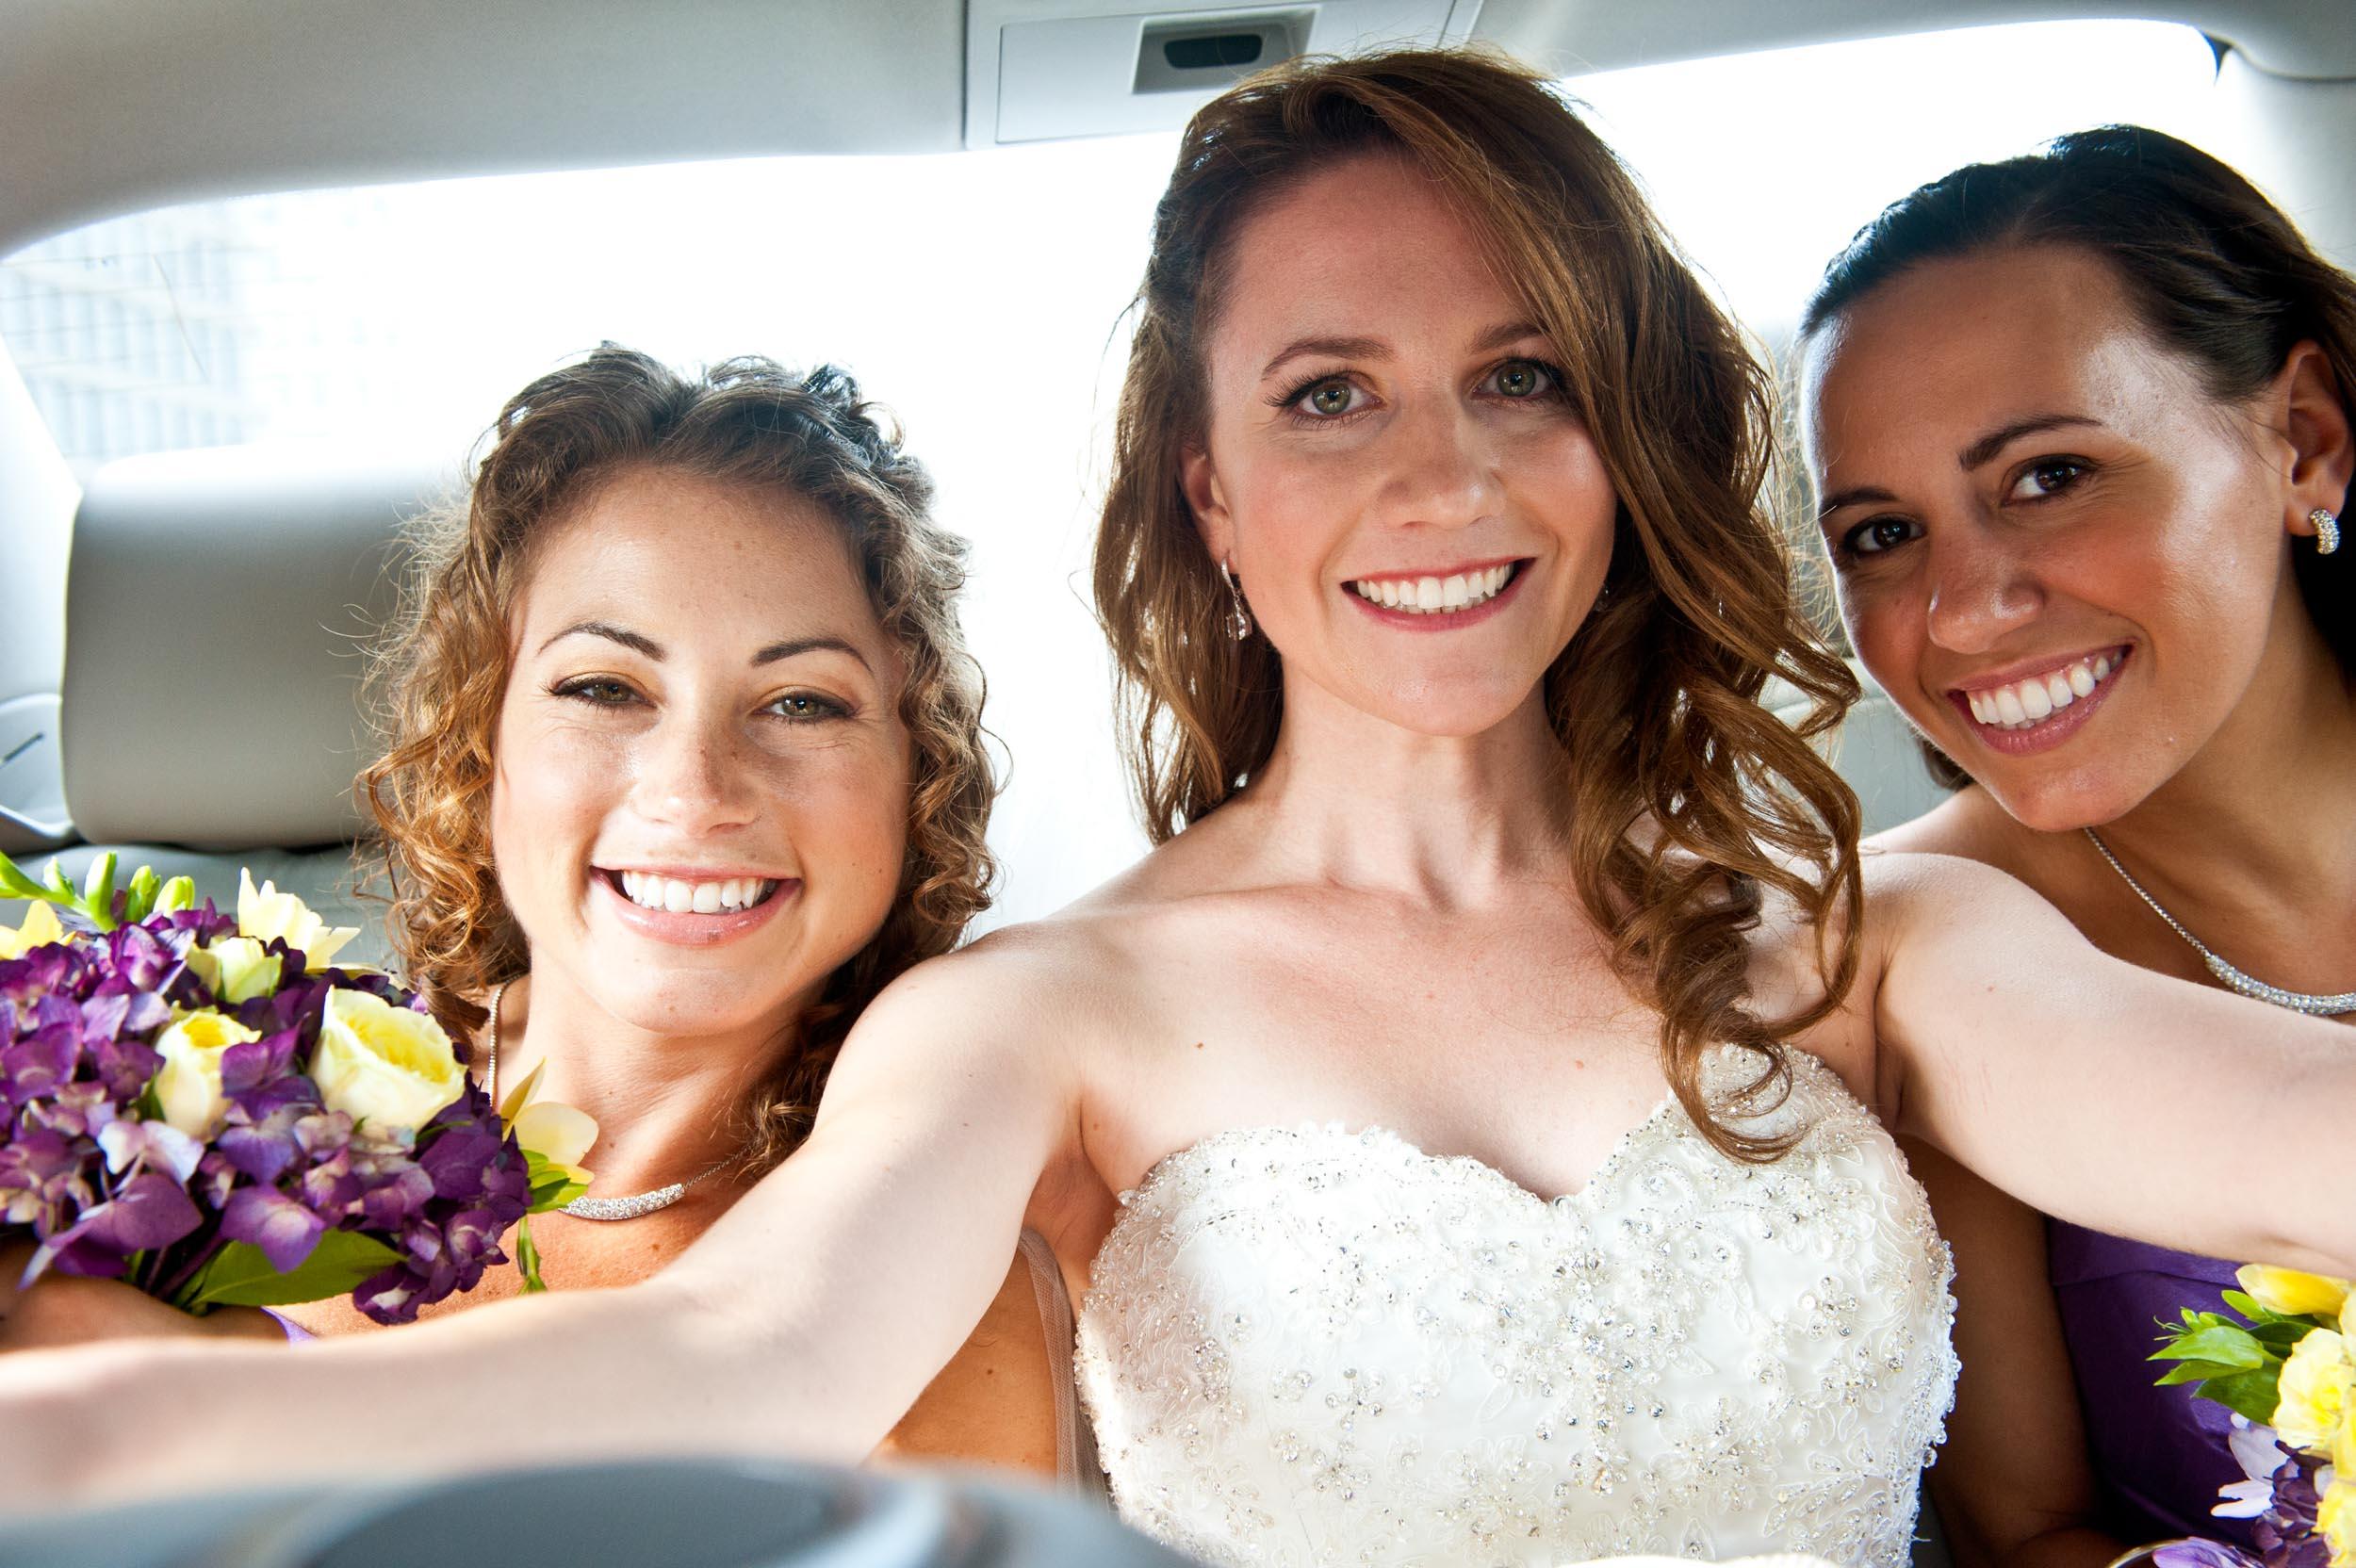 Wedding49Bride_In-a_Limo-2.jpg